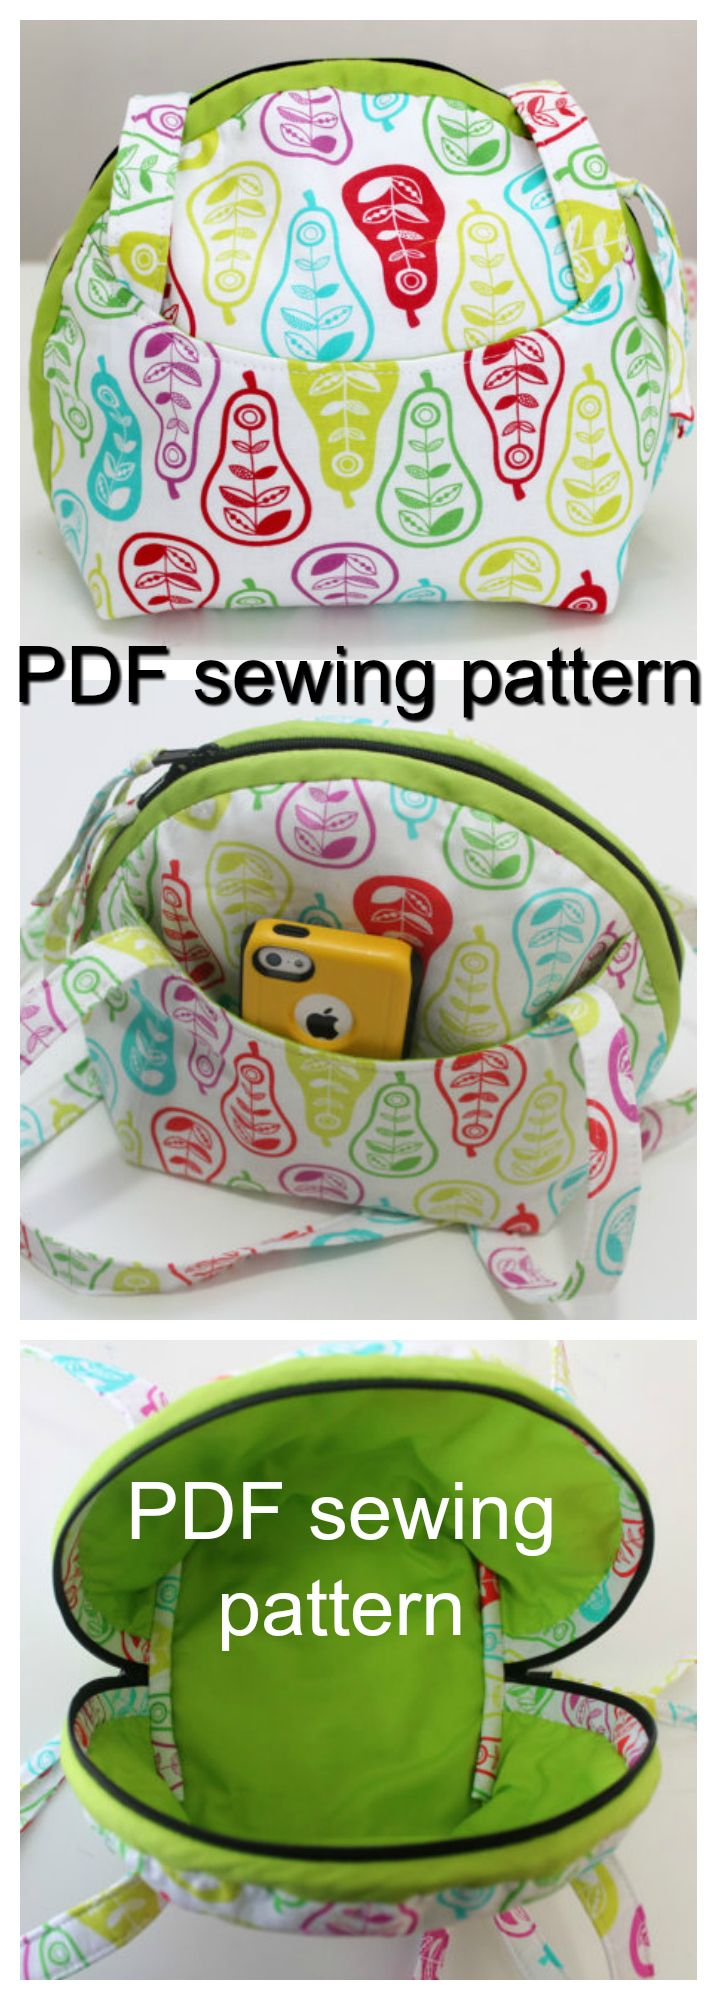 PDF downloadable purse sewing pattern.